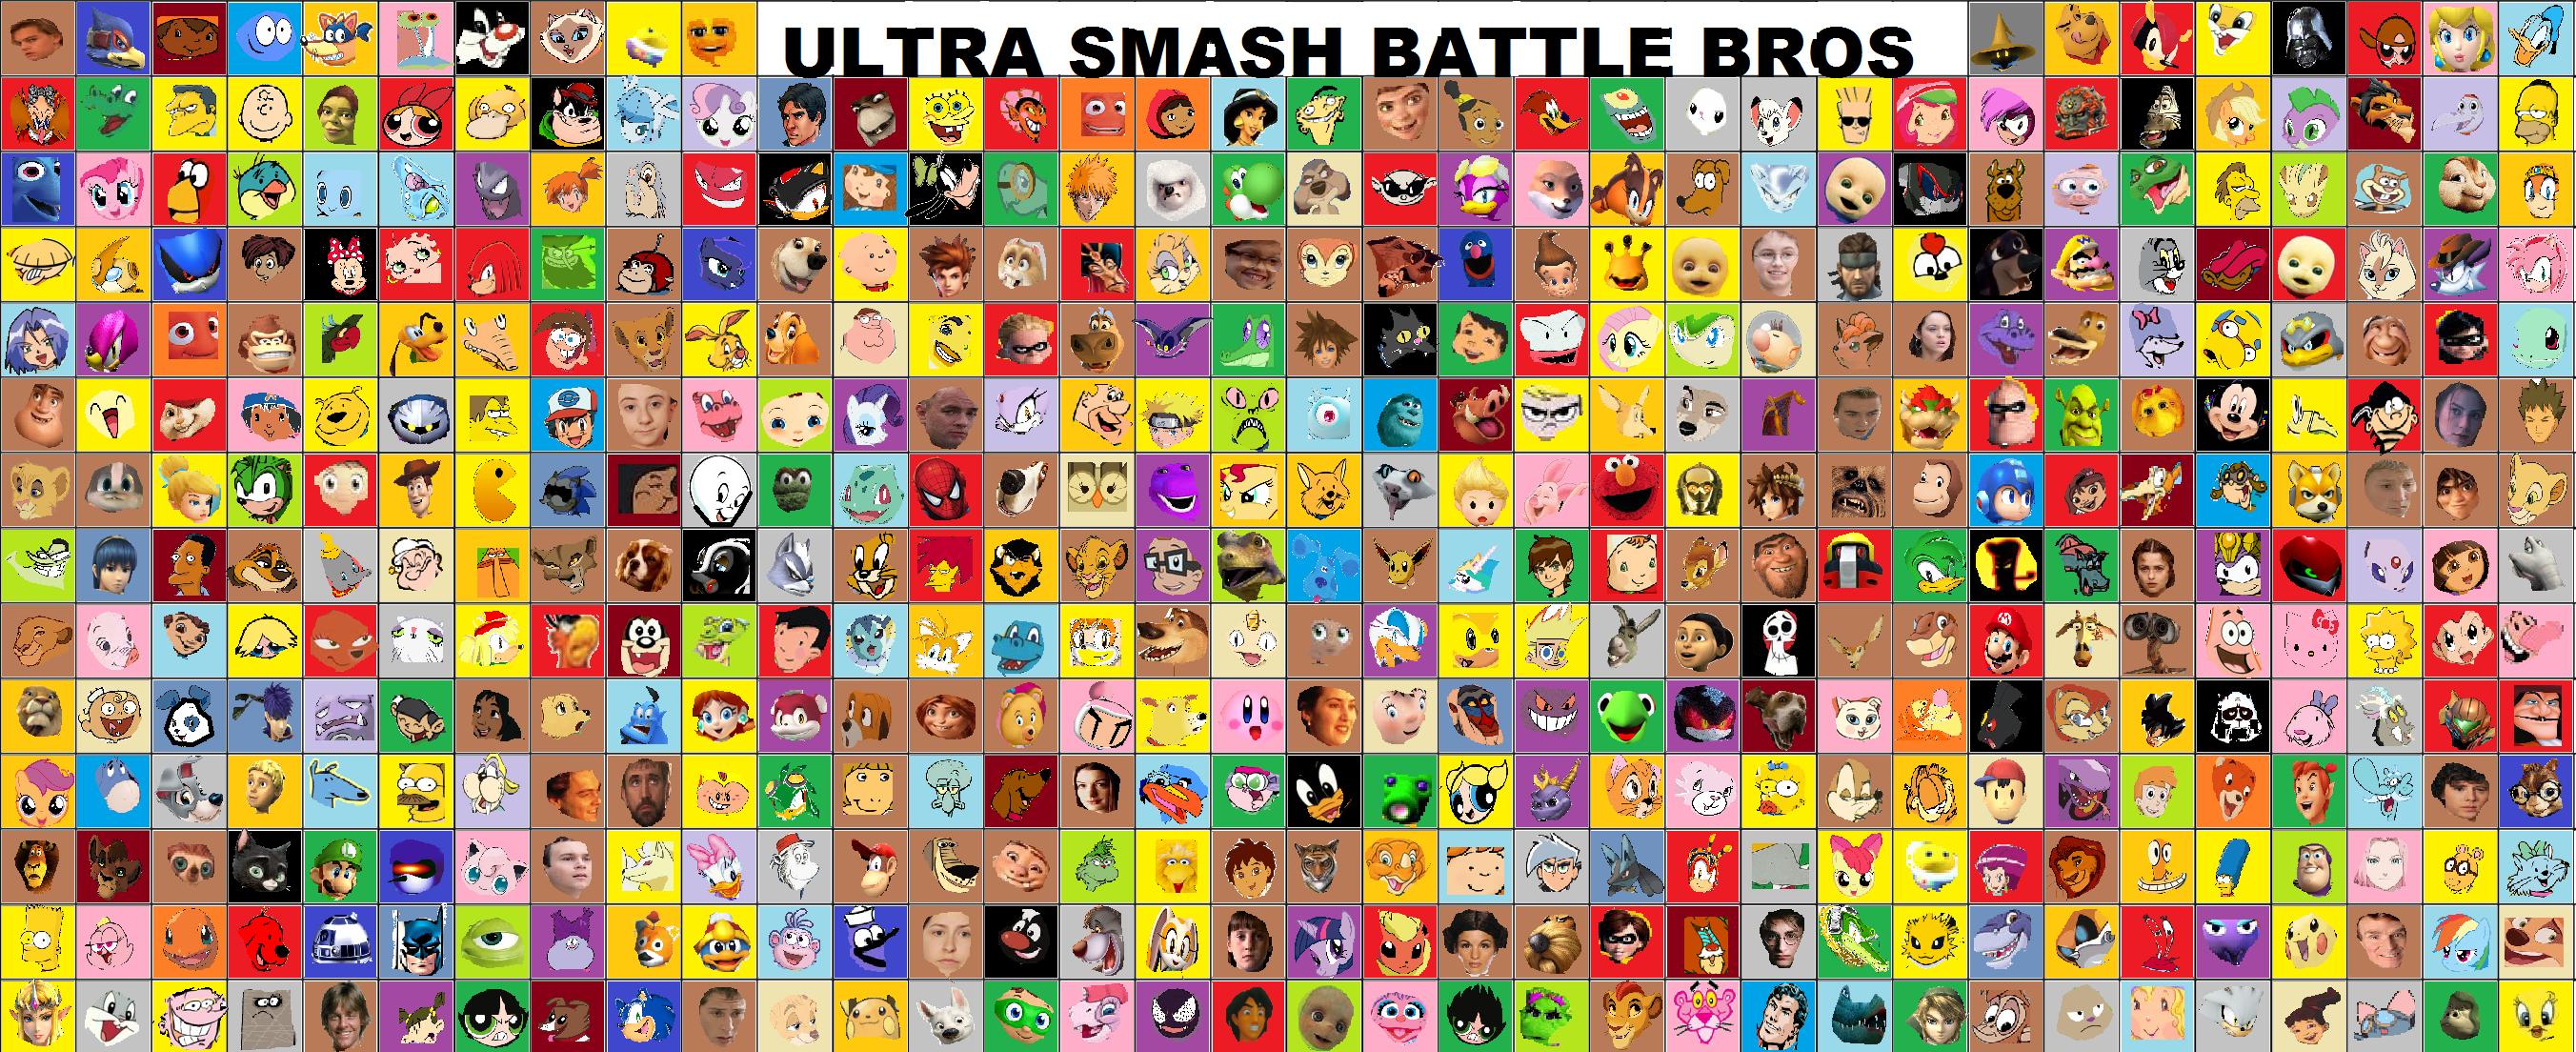 Ultra Smash Battle Bros